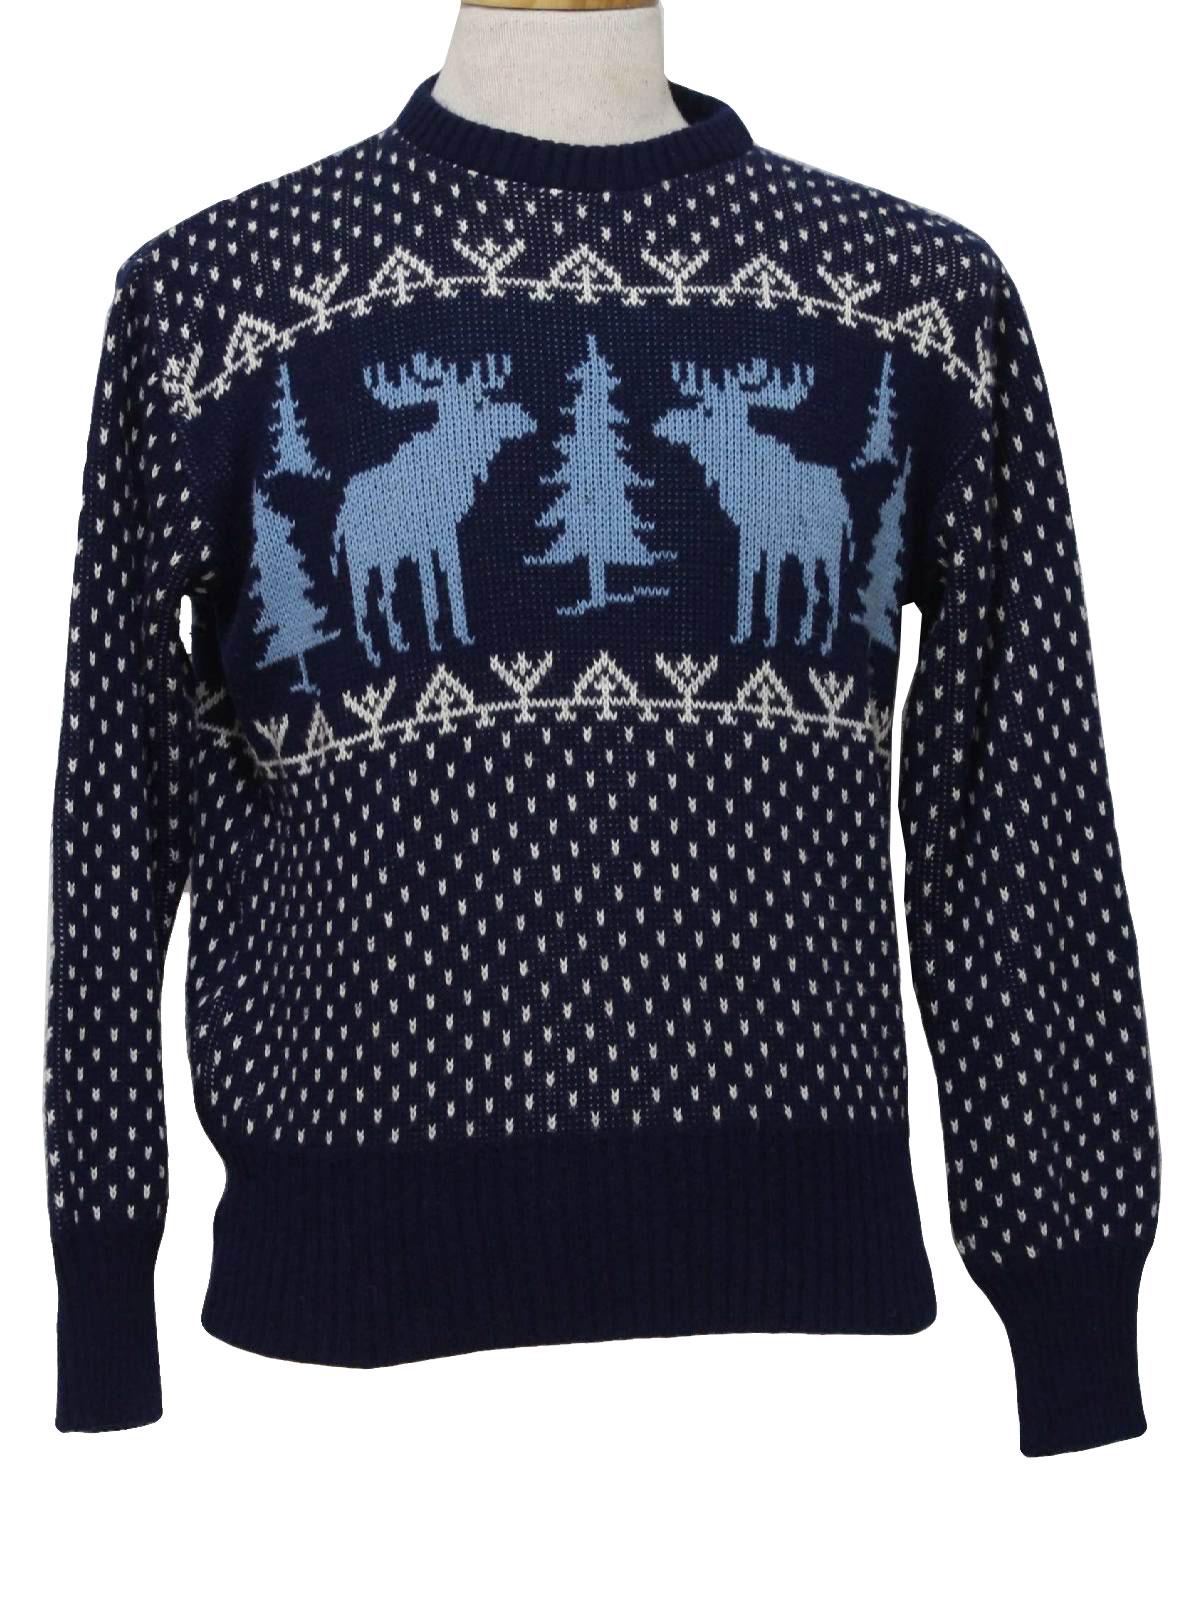 Ugly Xmas Sweater Ideas